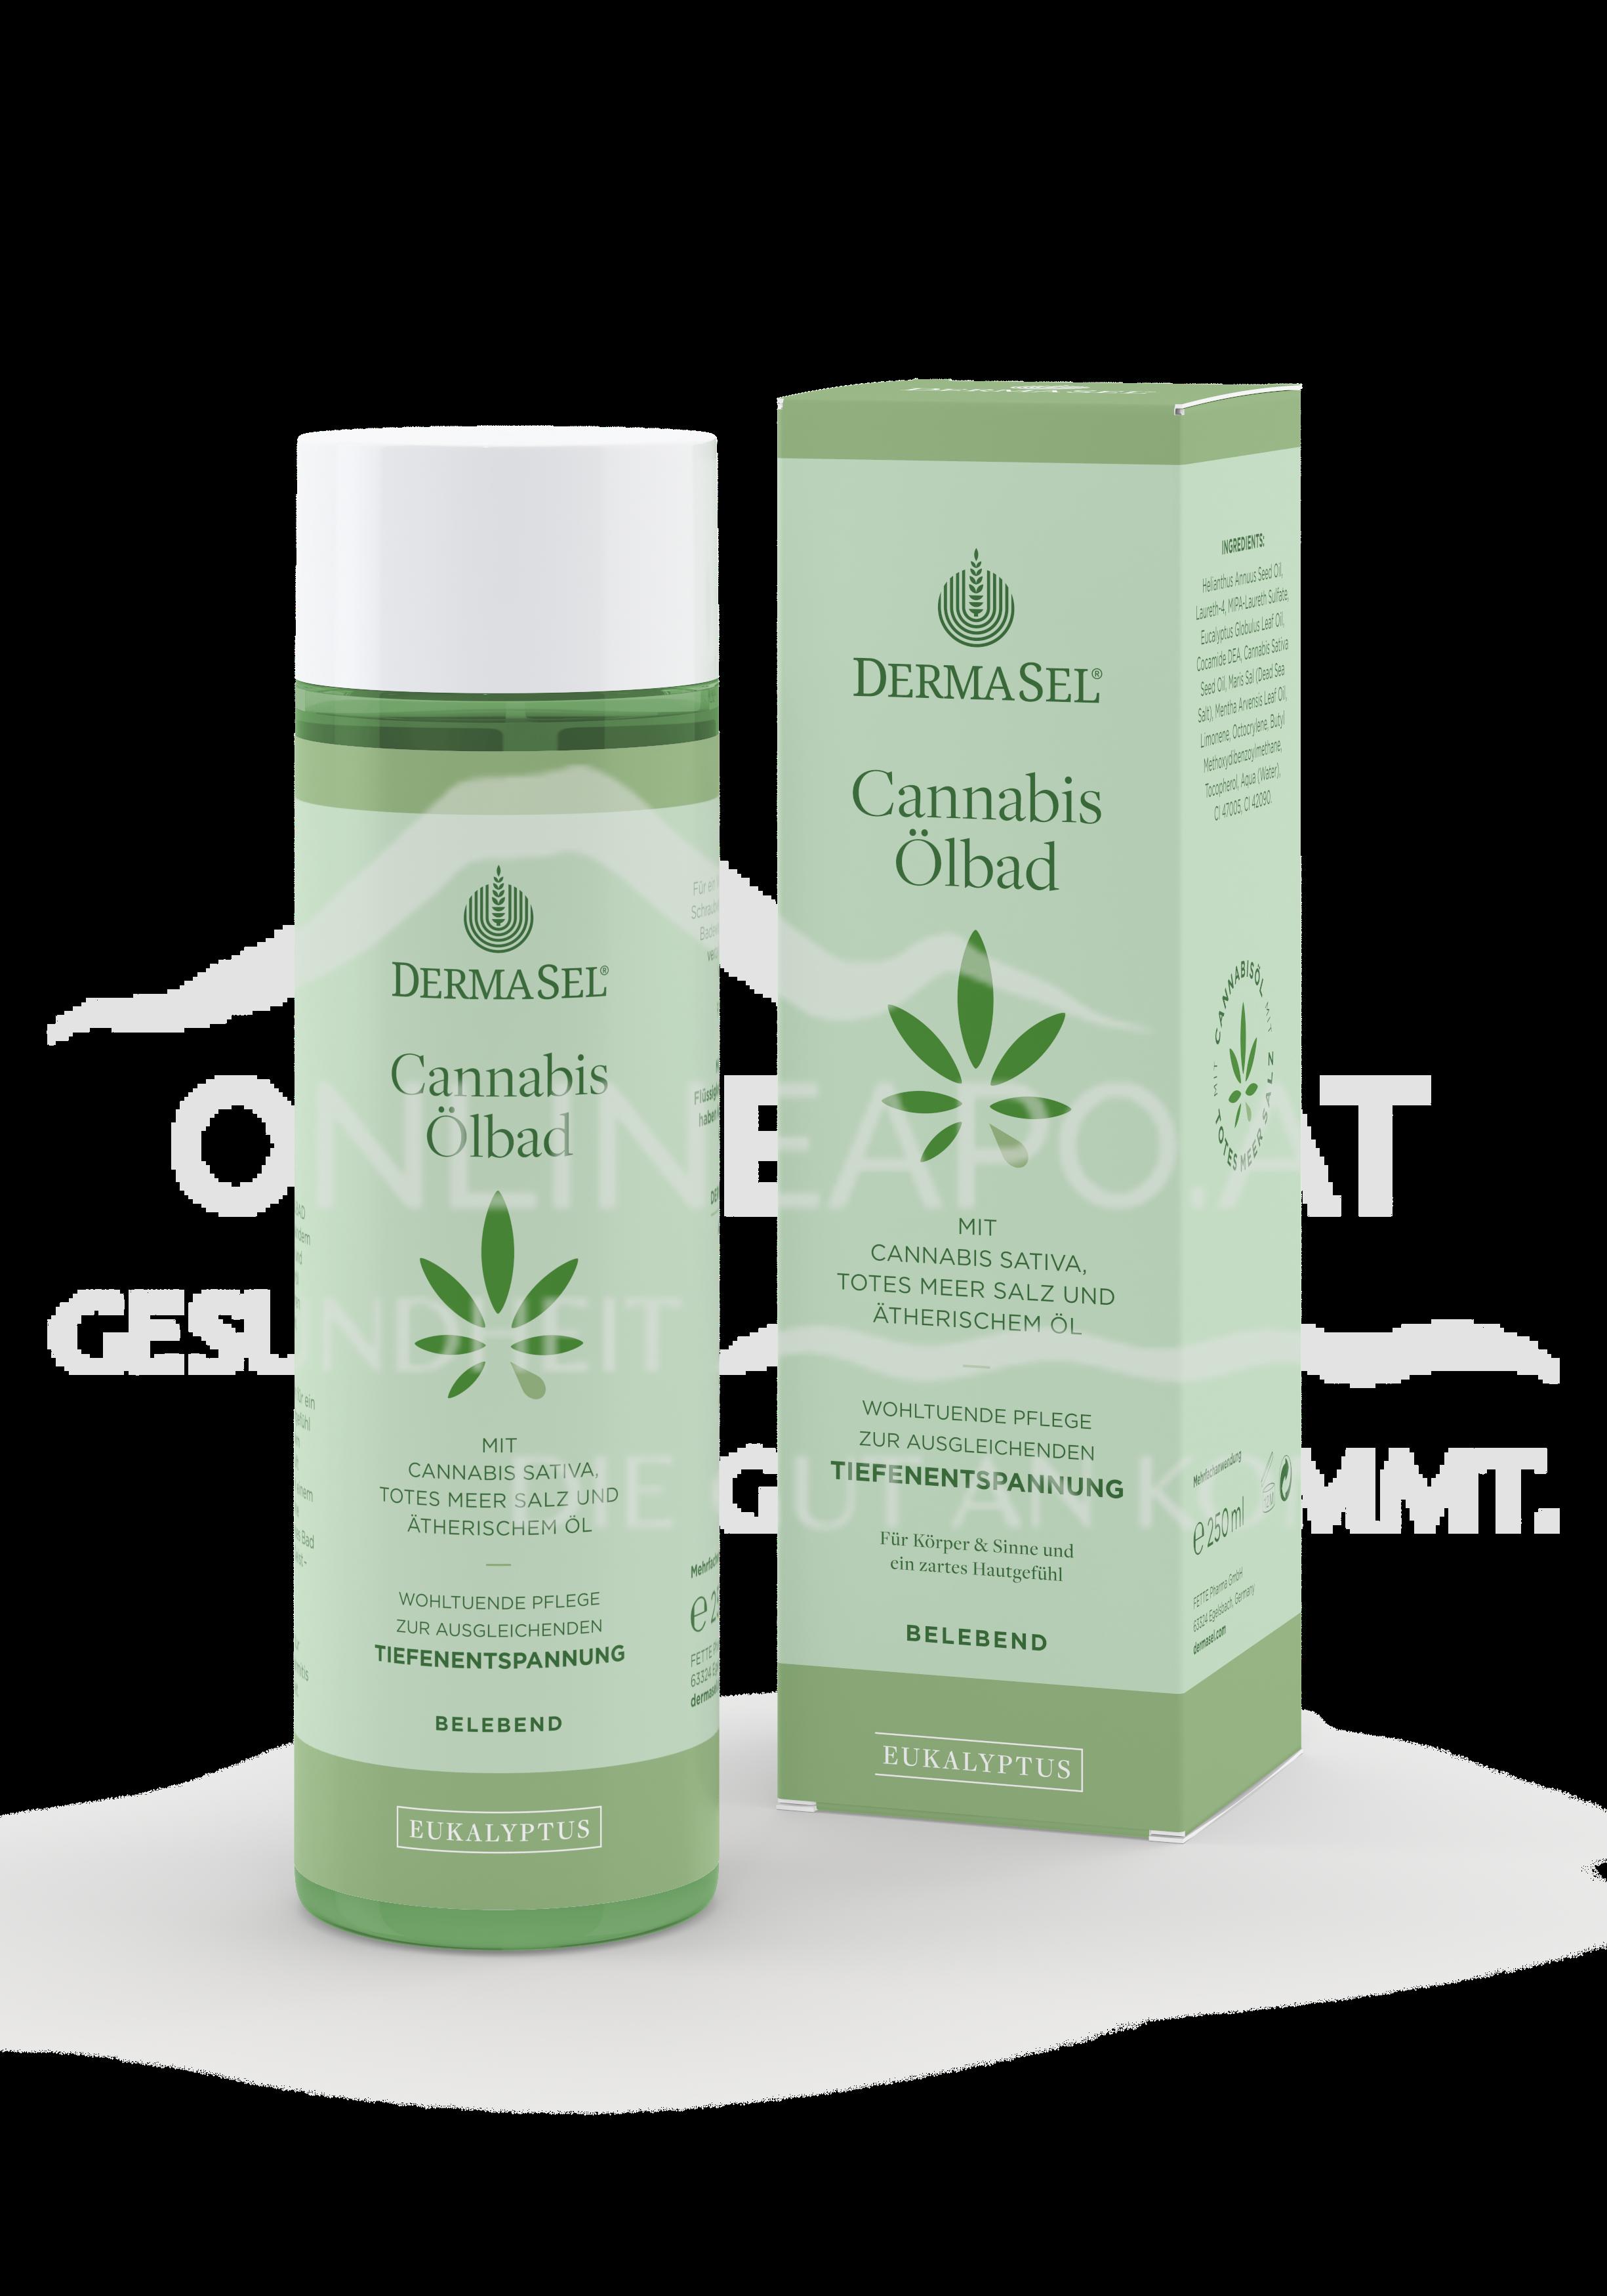 DermaSel® Cannabis Ölbad Eukalyptus